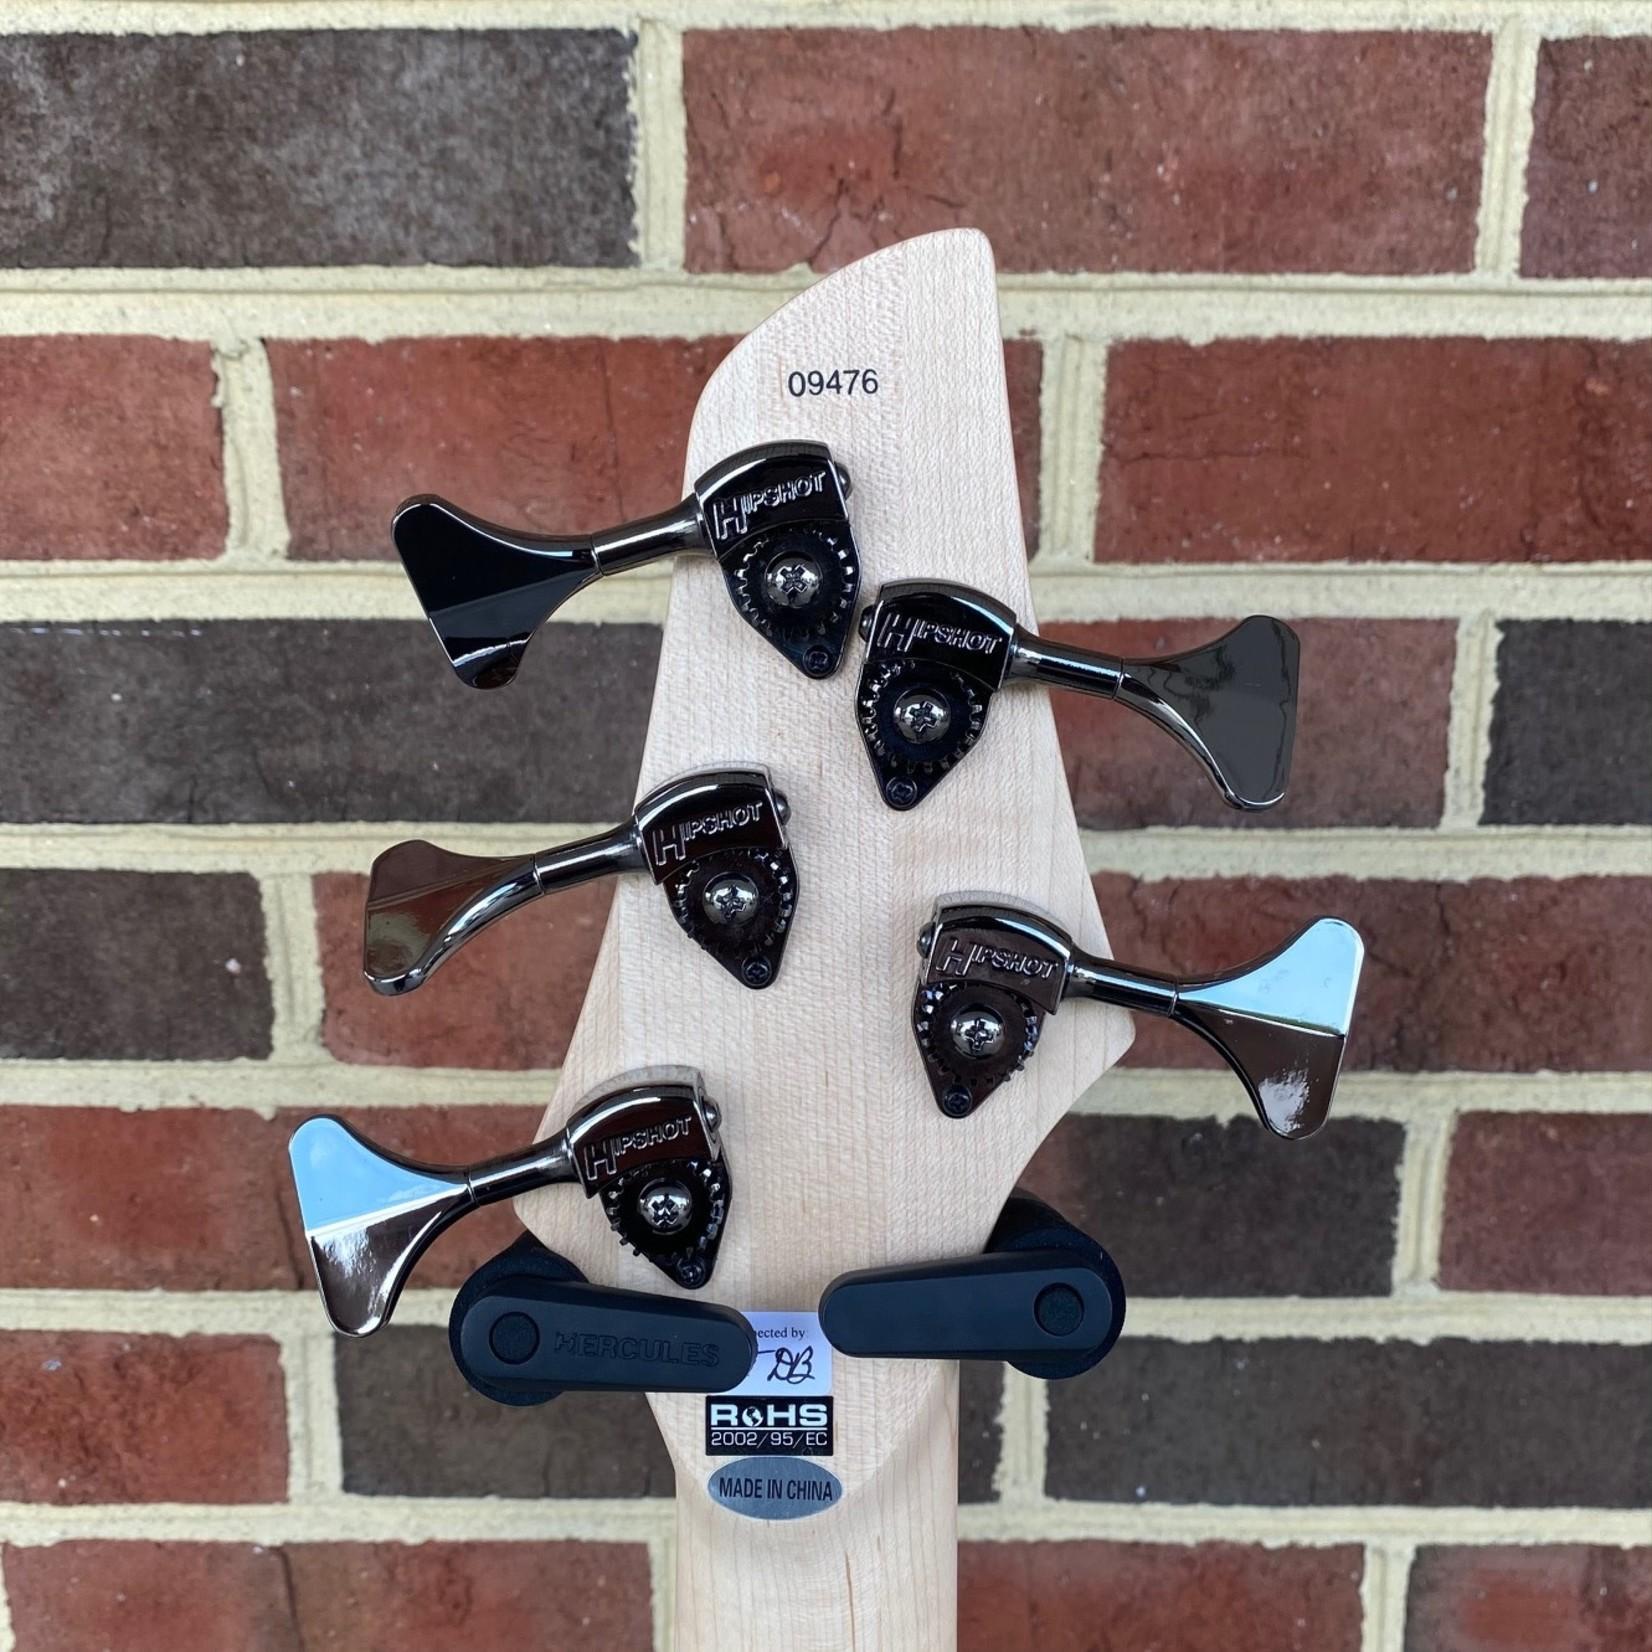 Dingwall Dingwall NG2 5-String, Ducati Matte White, Maple Fretboard, Matching Headstock, Dingwall Gig Bag, SN# 9476